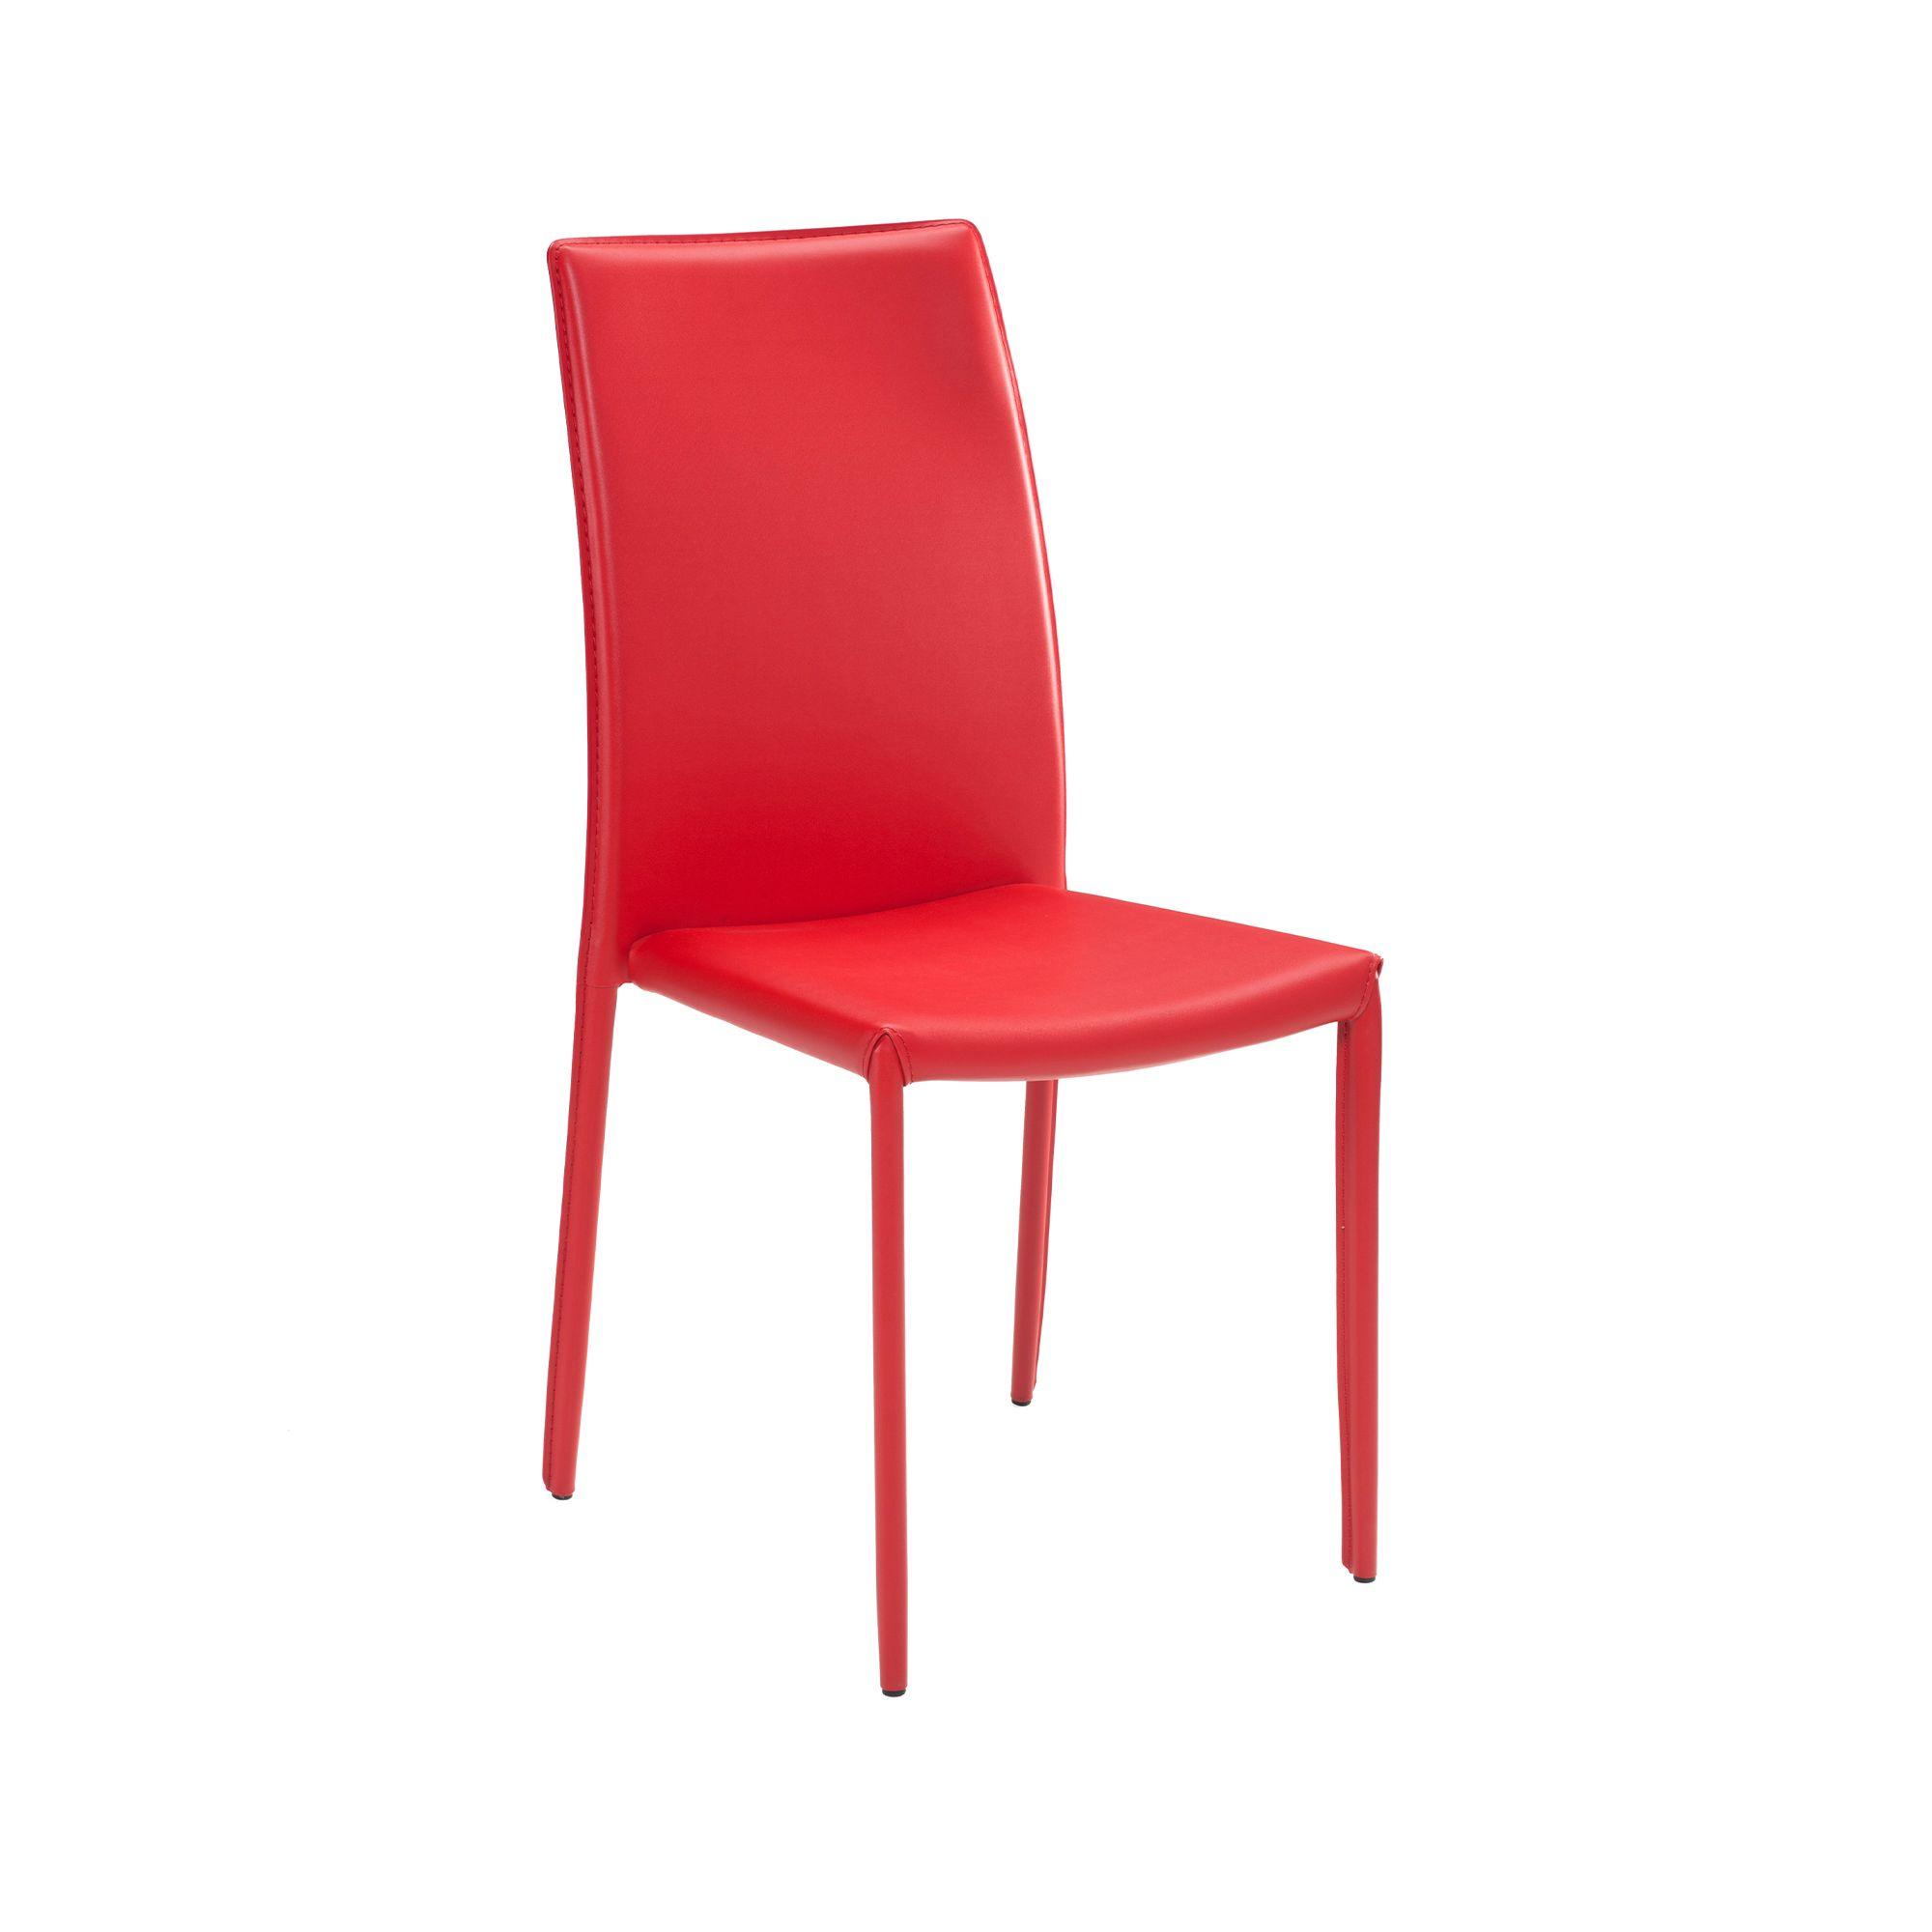 Model 176 chair in modern style